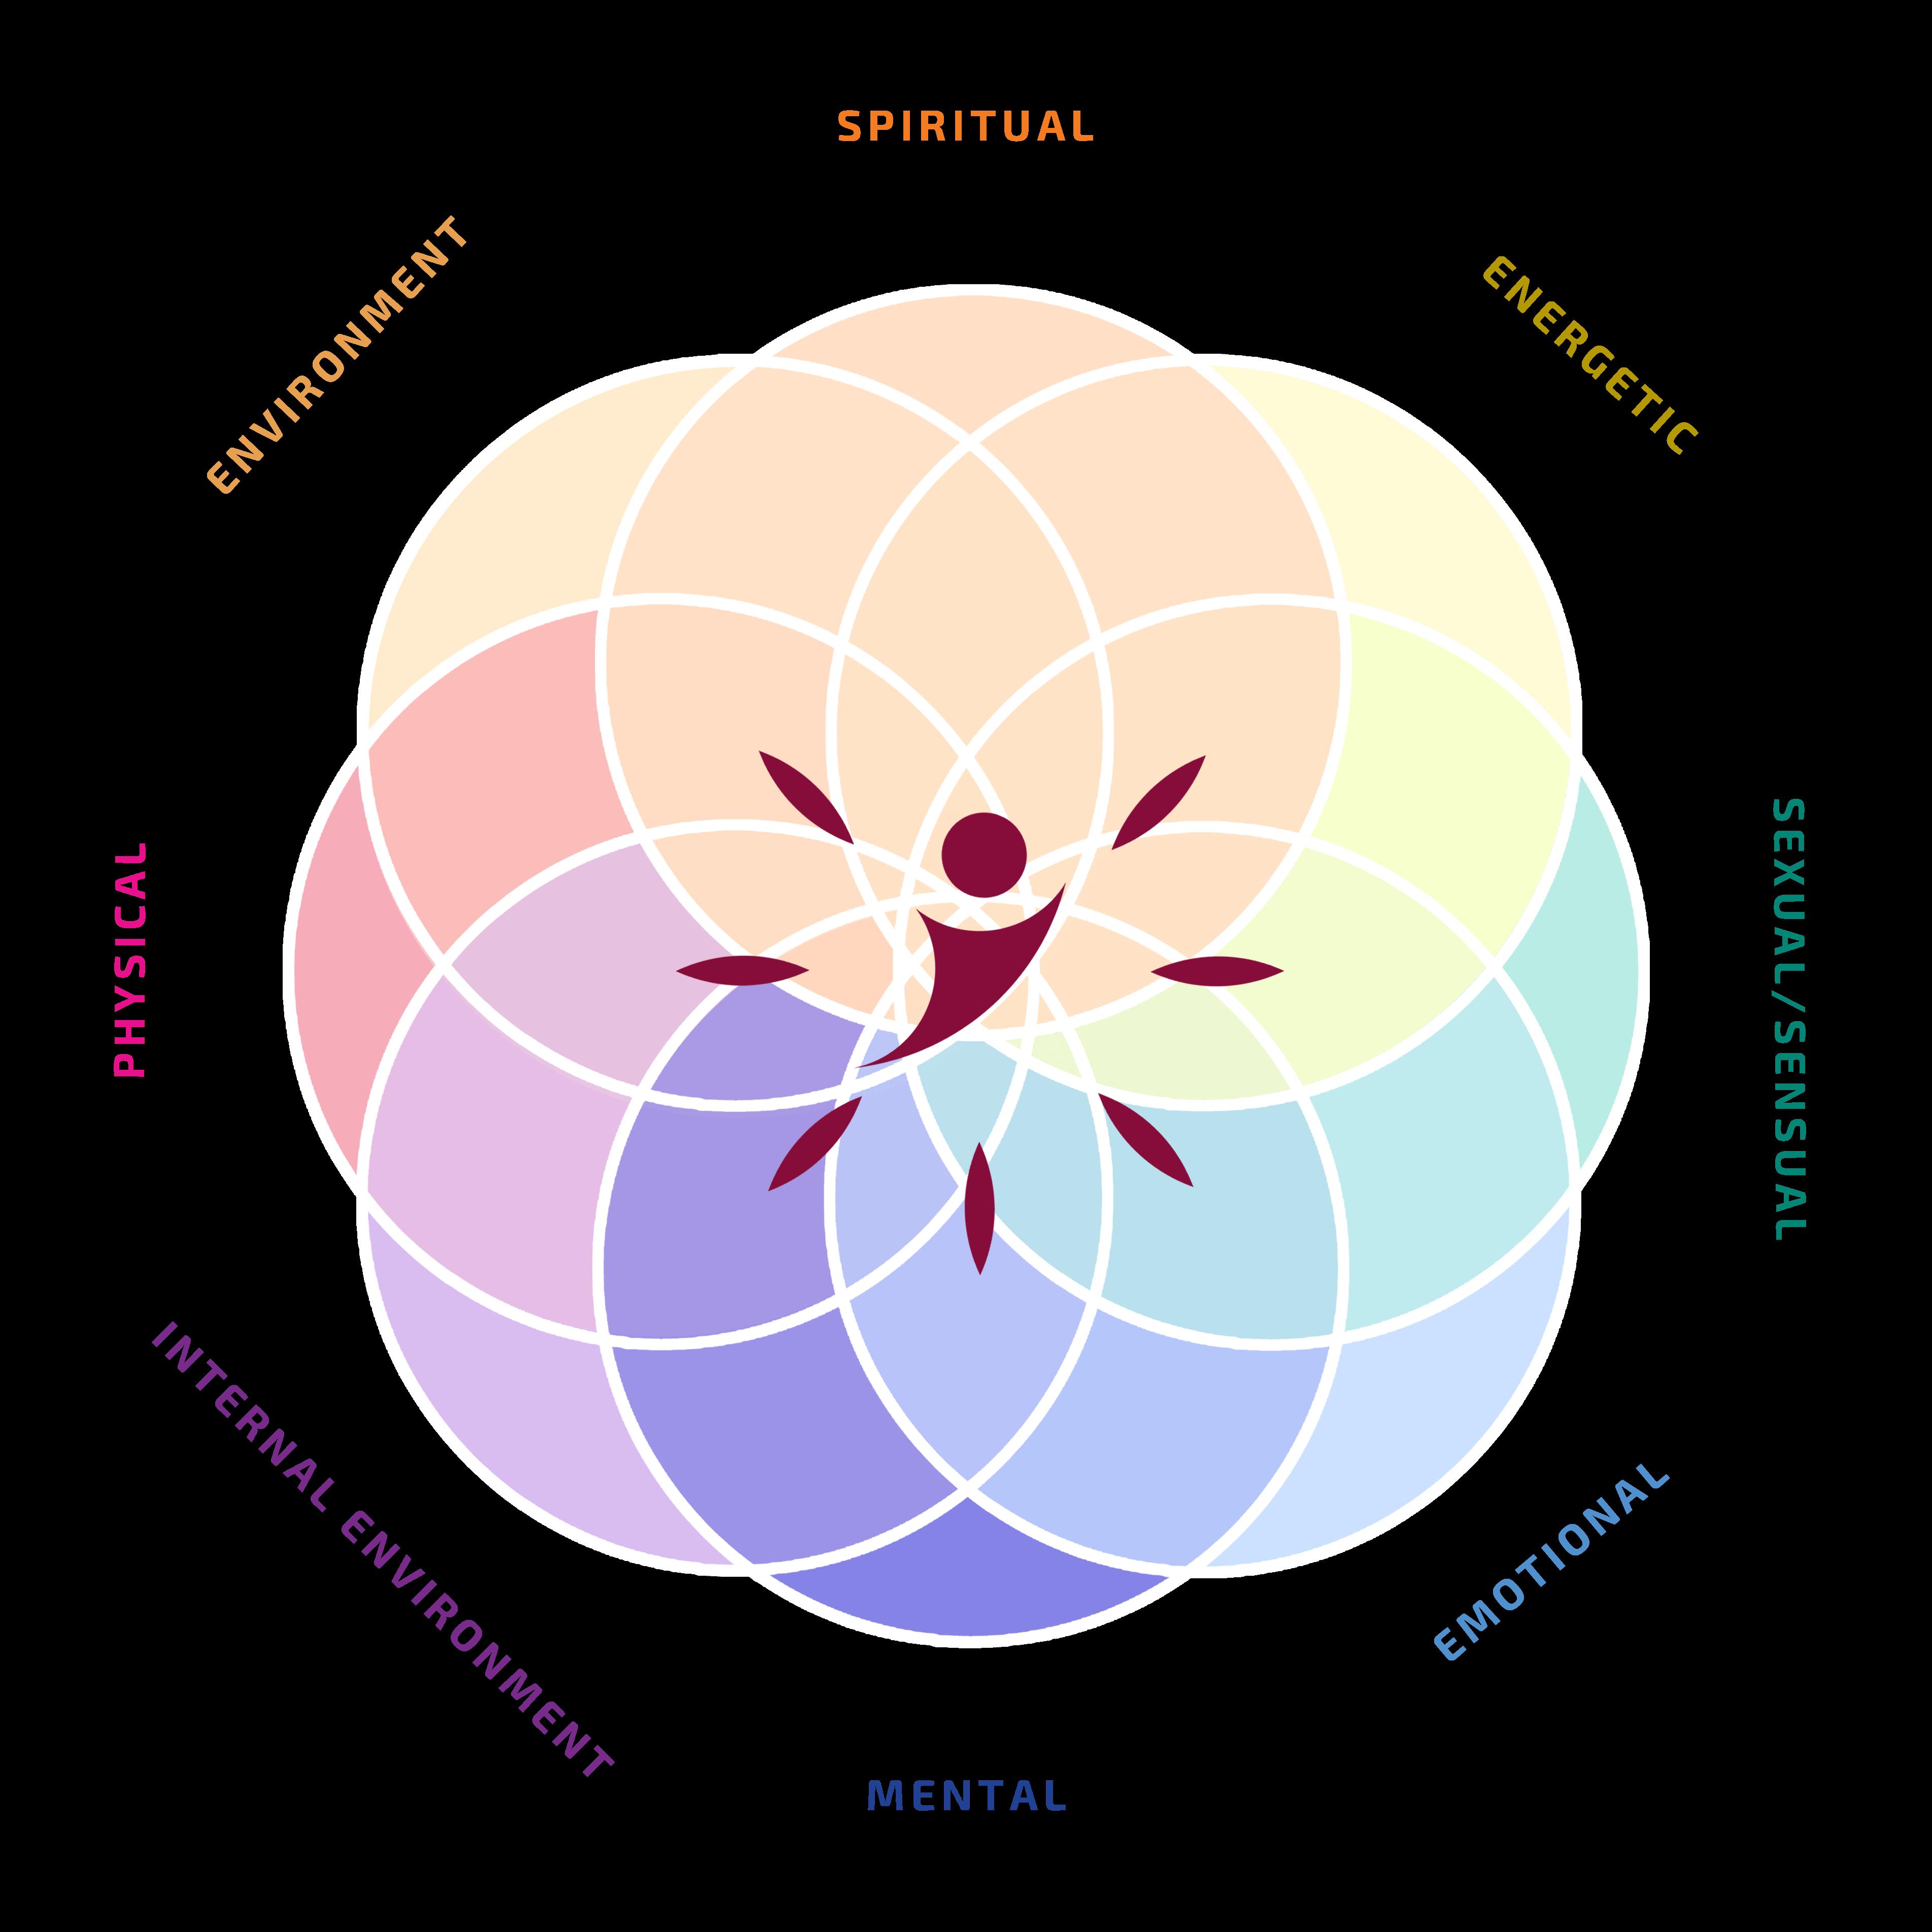 Mind body spirit- Copyright Flametree personal development and healing system